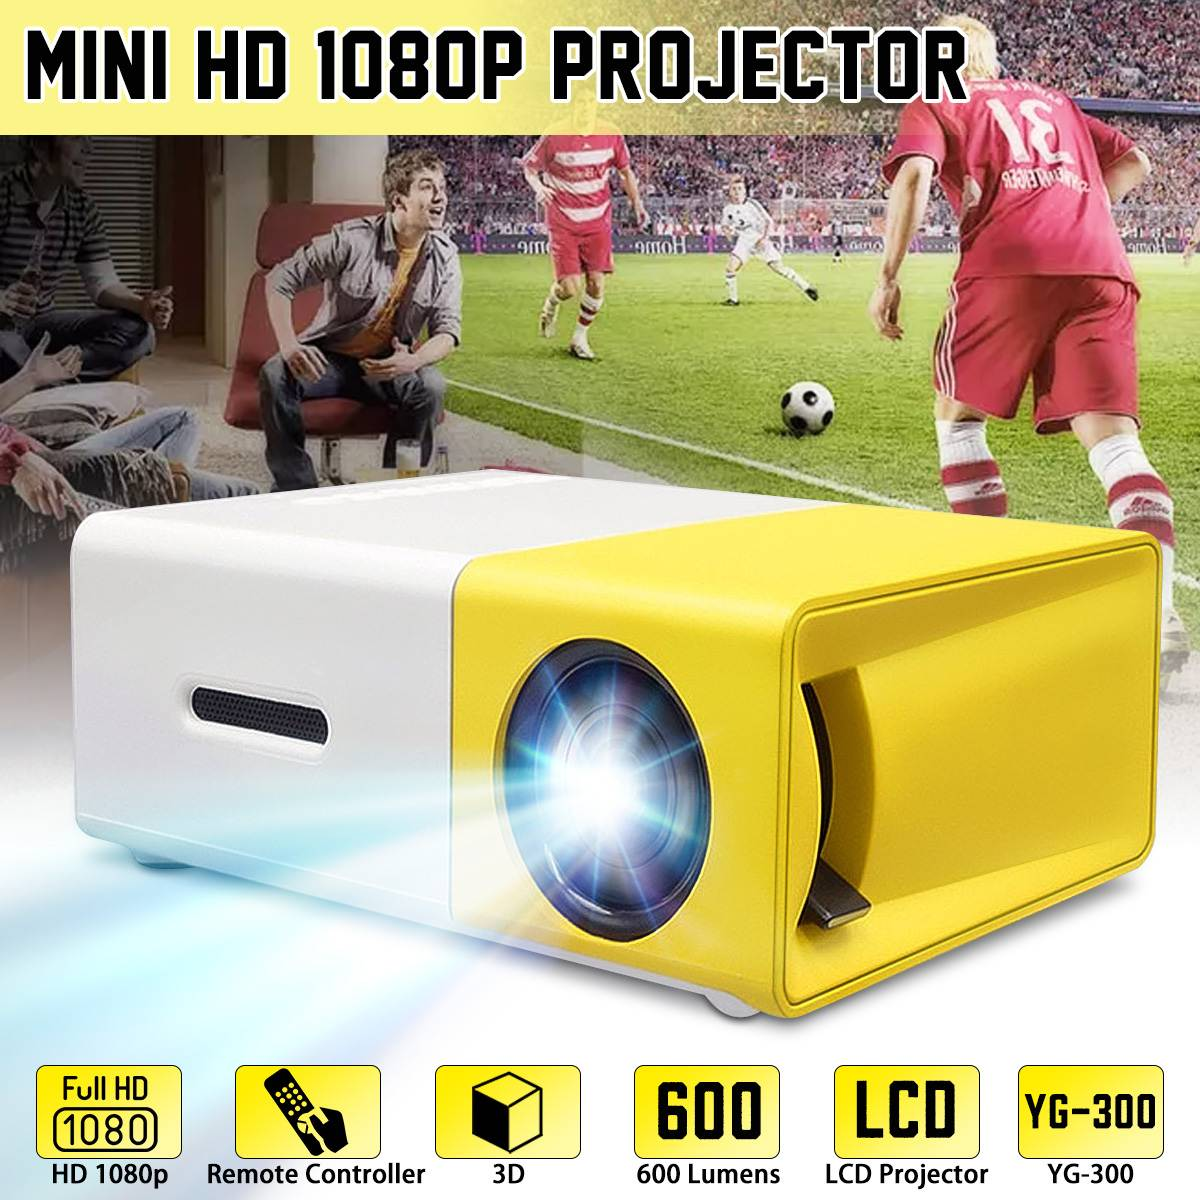 YG-300 Mini LCD LED proyector 400-600 lúmenes 320x240x800: 1 soporte 1080P portátil Oficina hogar cine Proyector